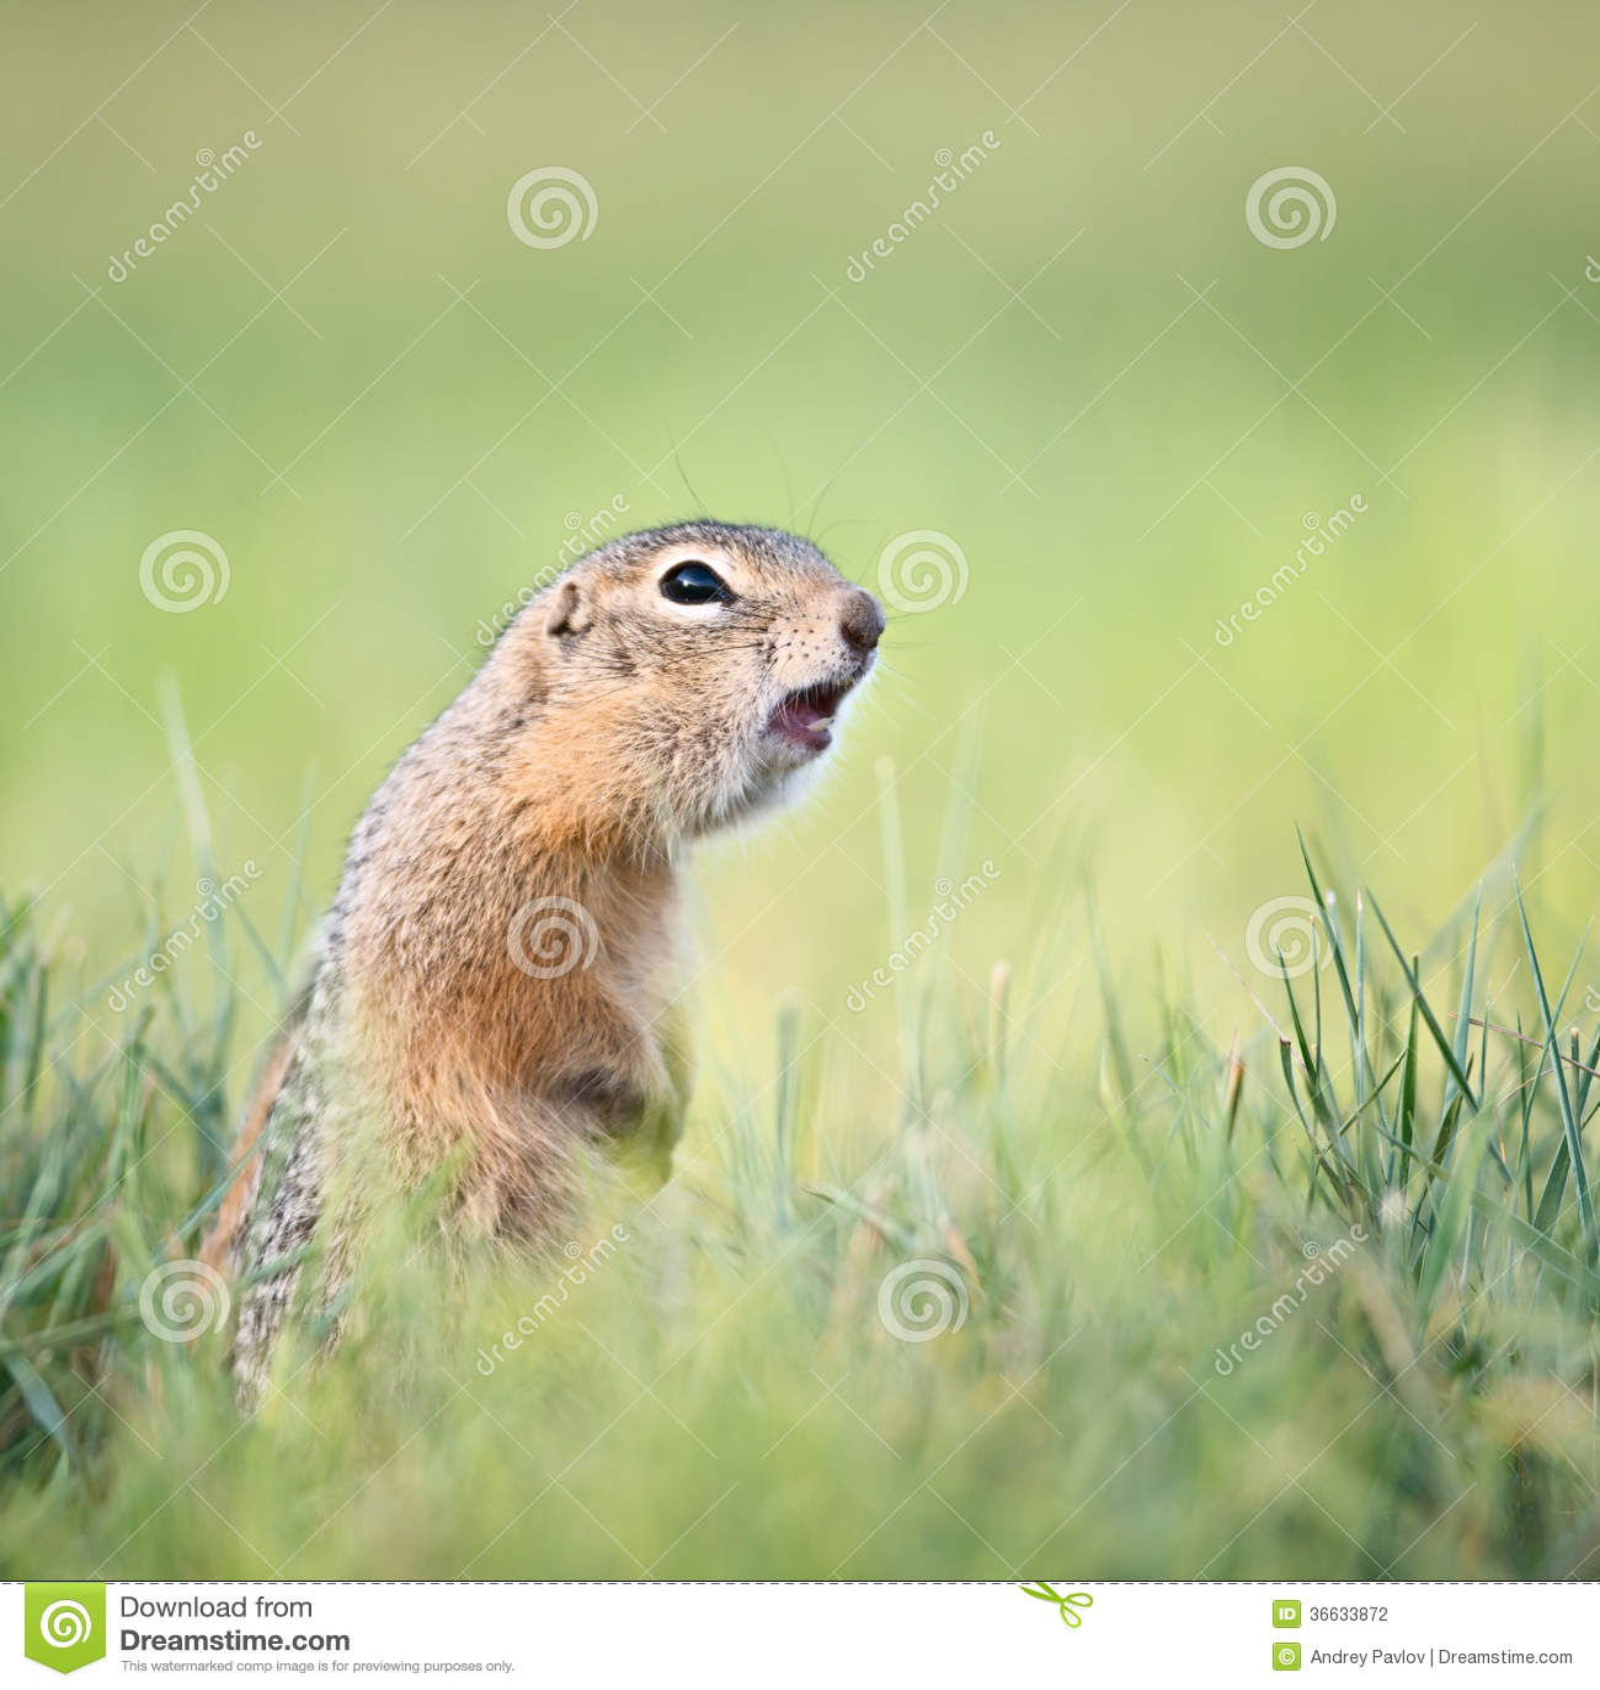 prairie dog screaming